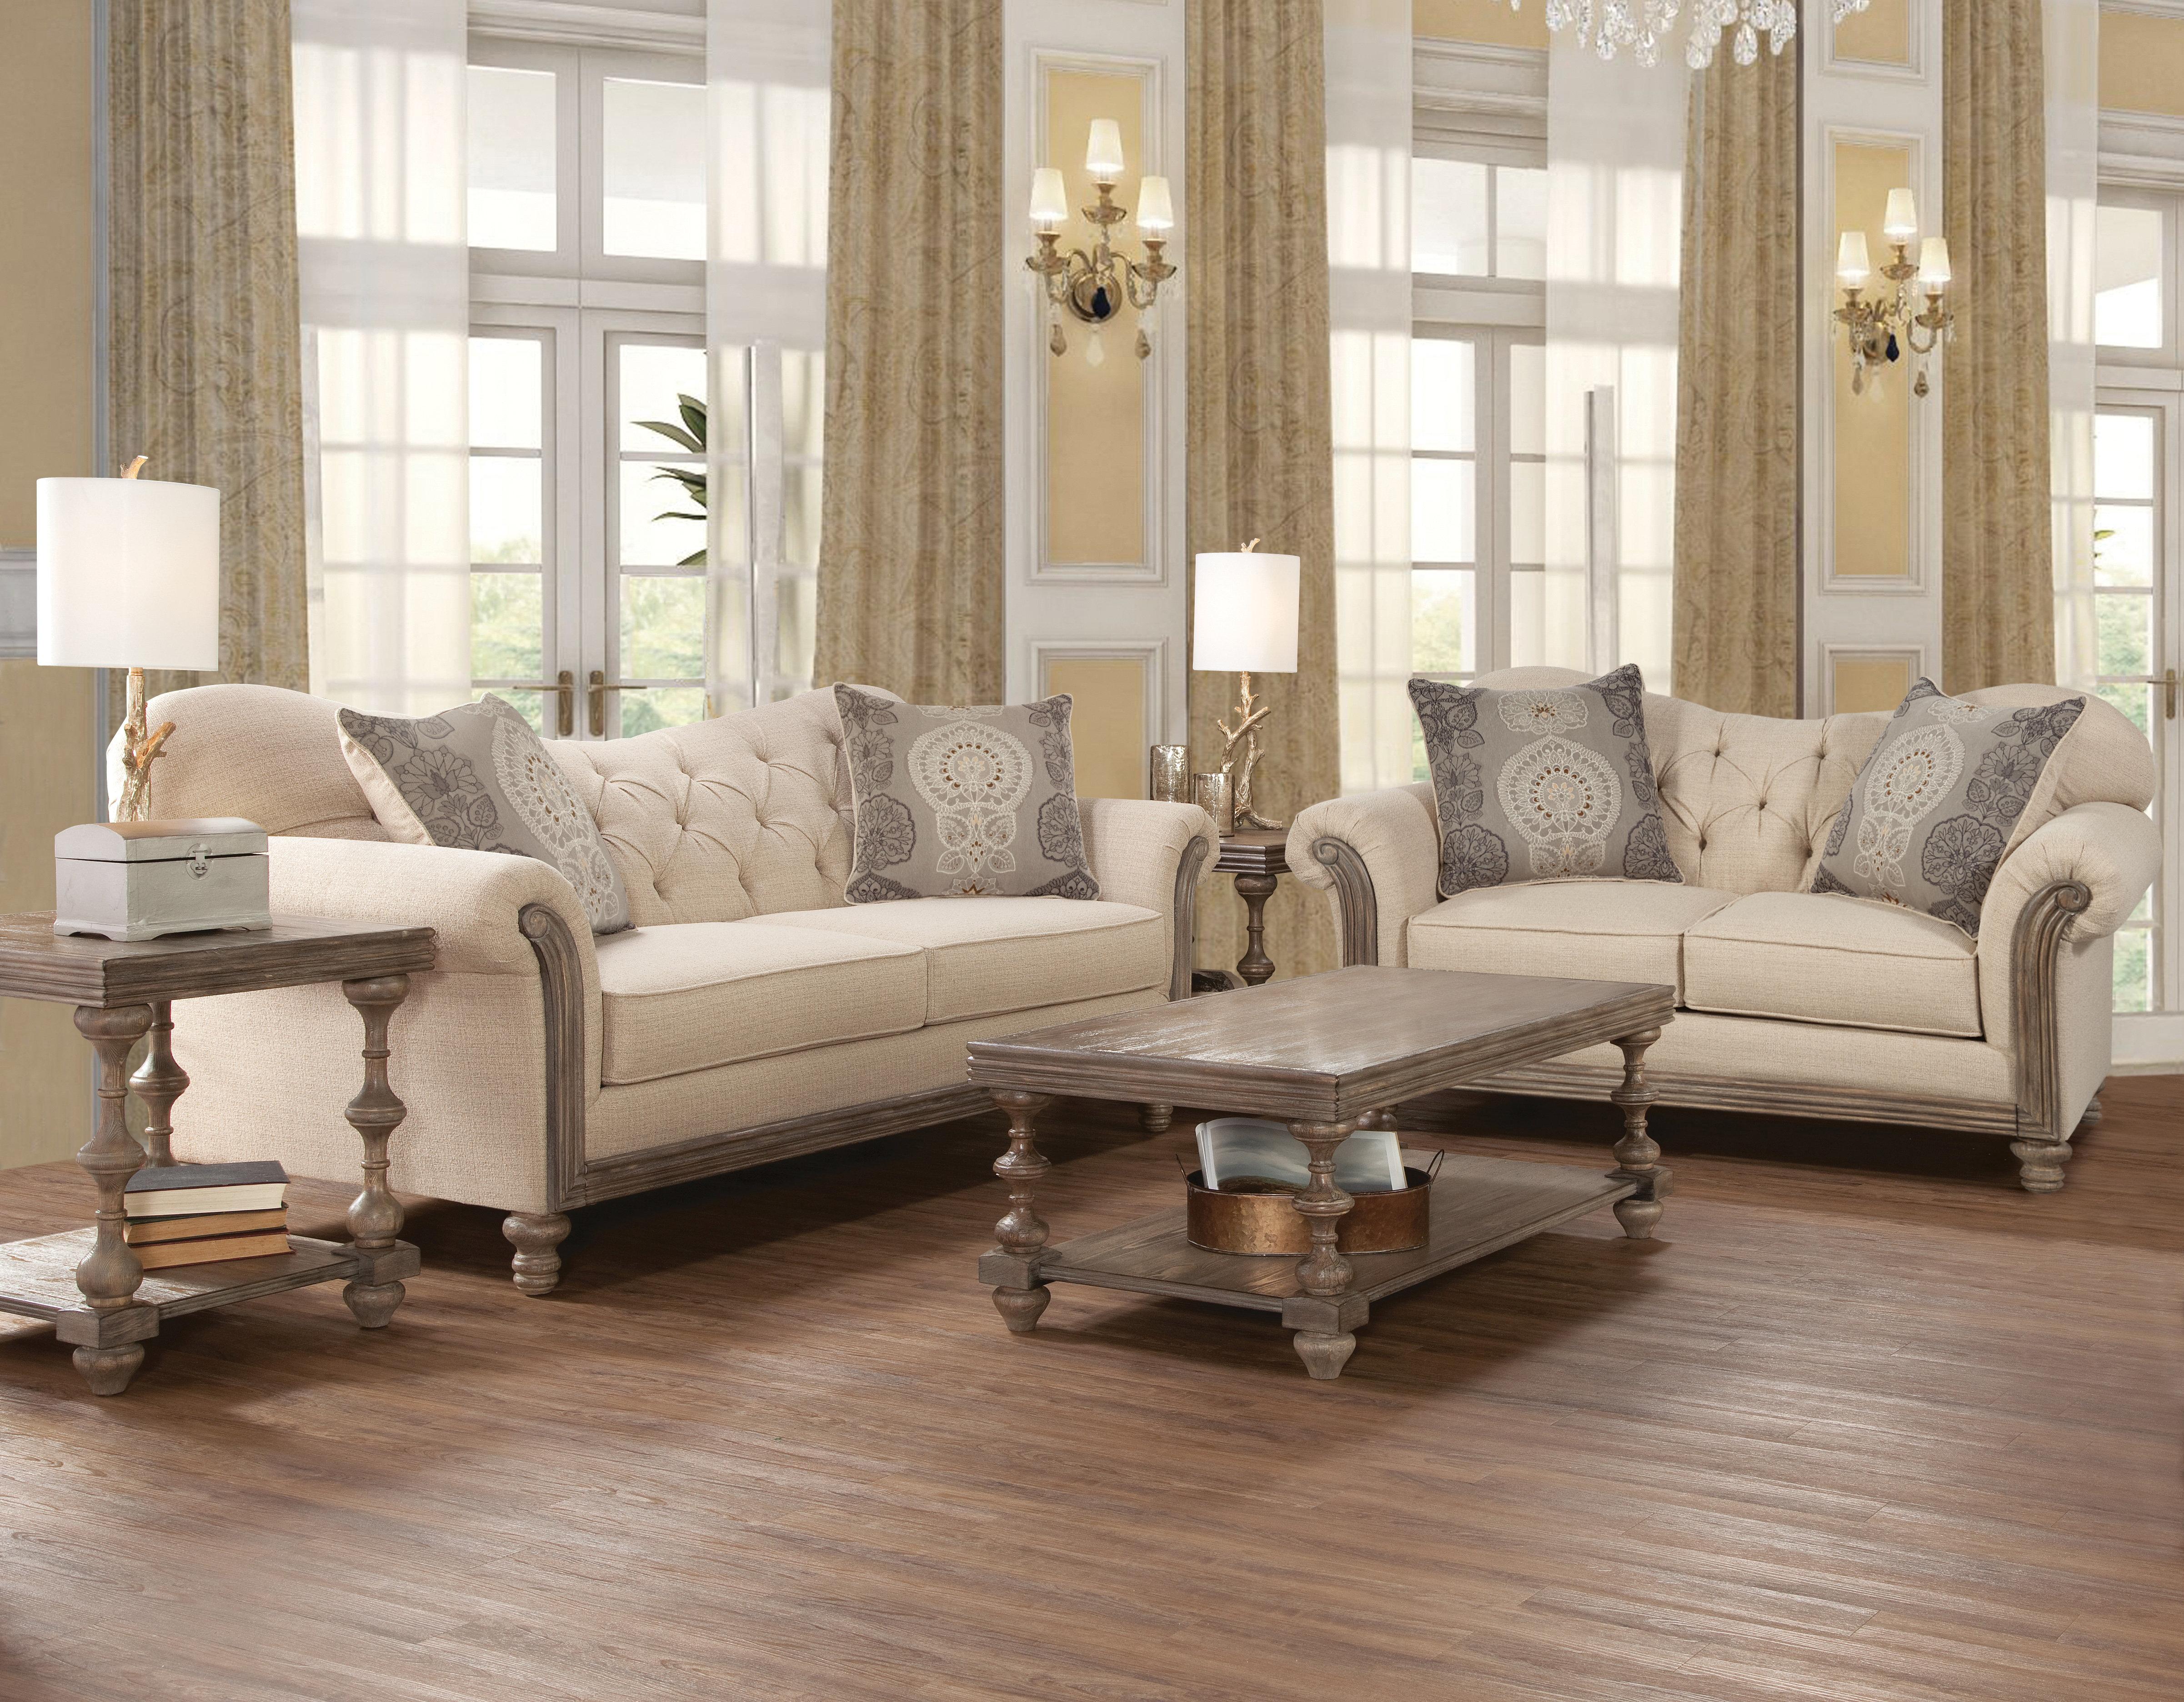 Larrick fabric tufted leather living room set wayfair